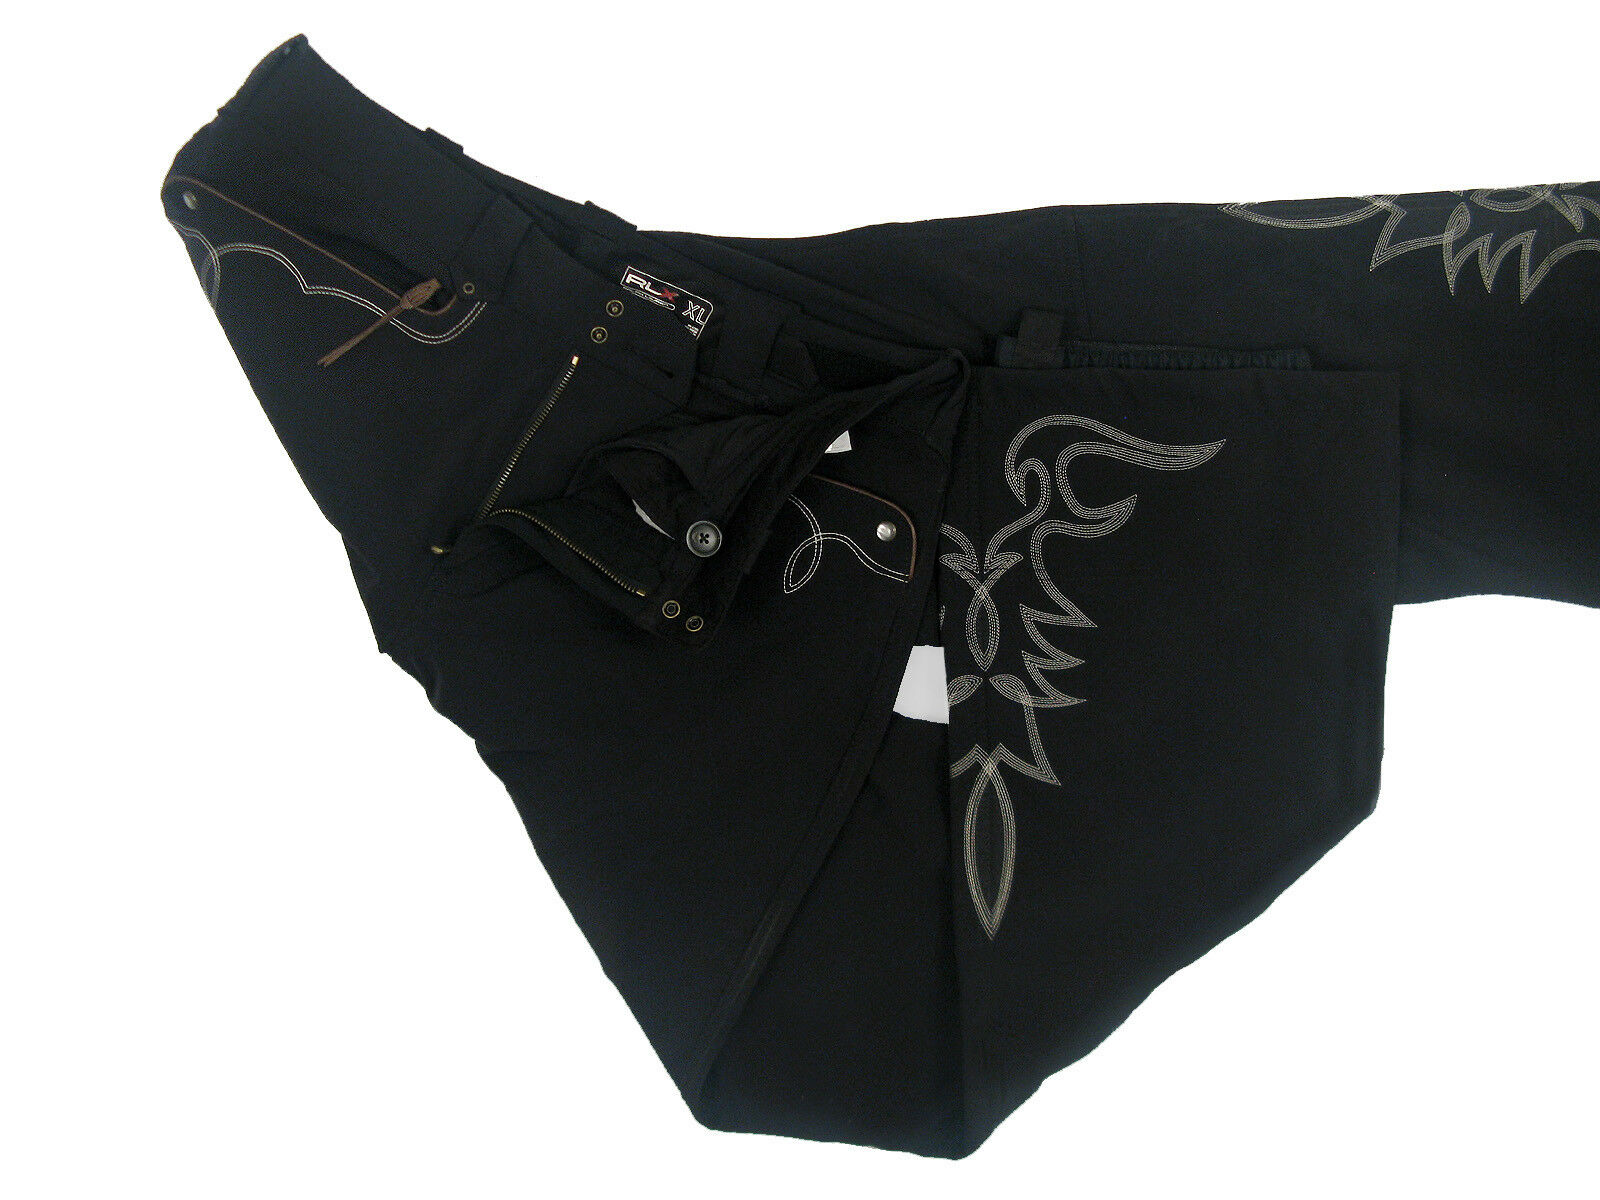 NEW   695 Ralph Lauren RLX Softshell Western Style Ski Pants  XL  (36 x 34.5)